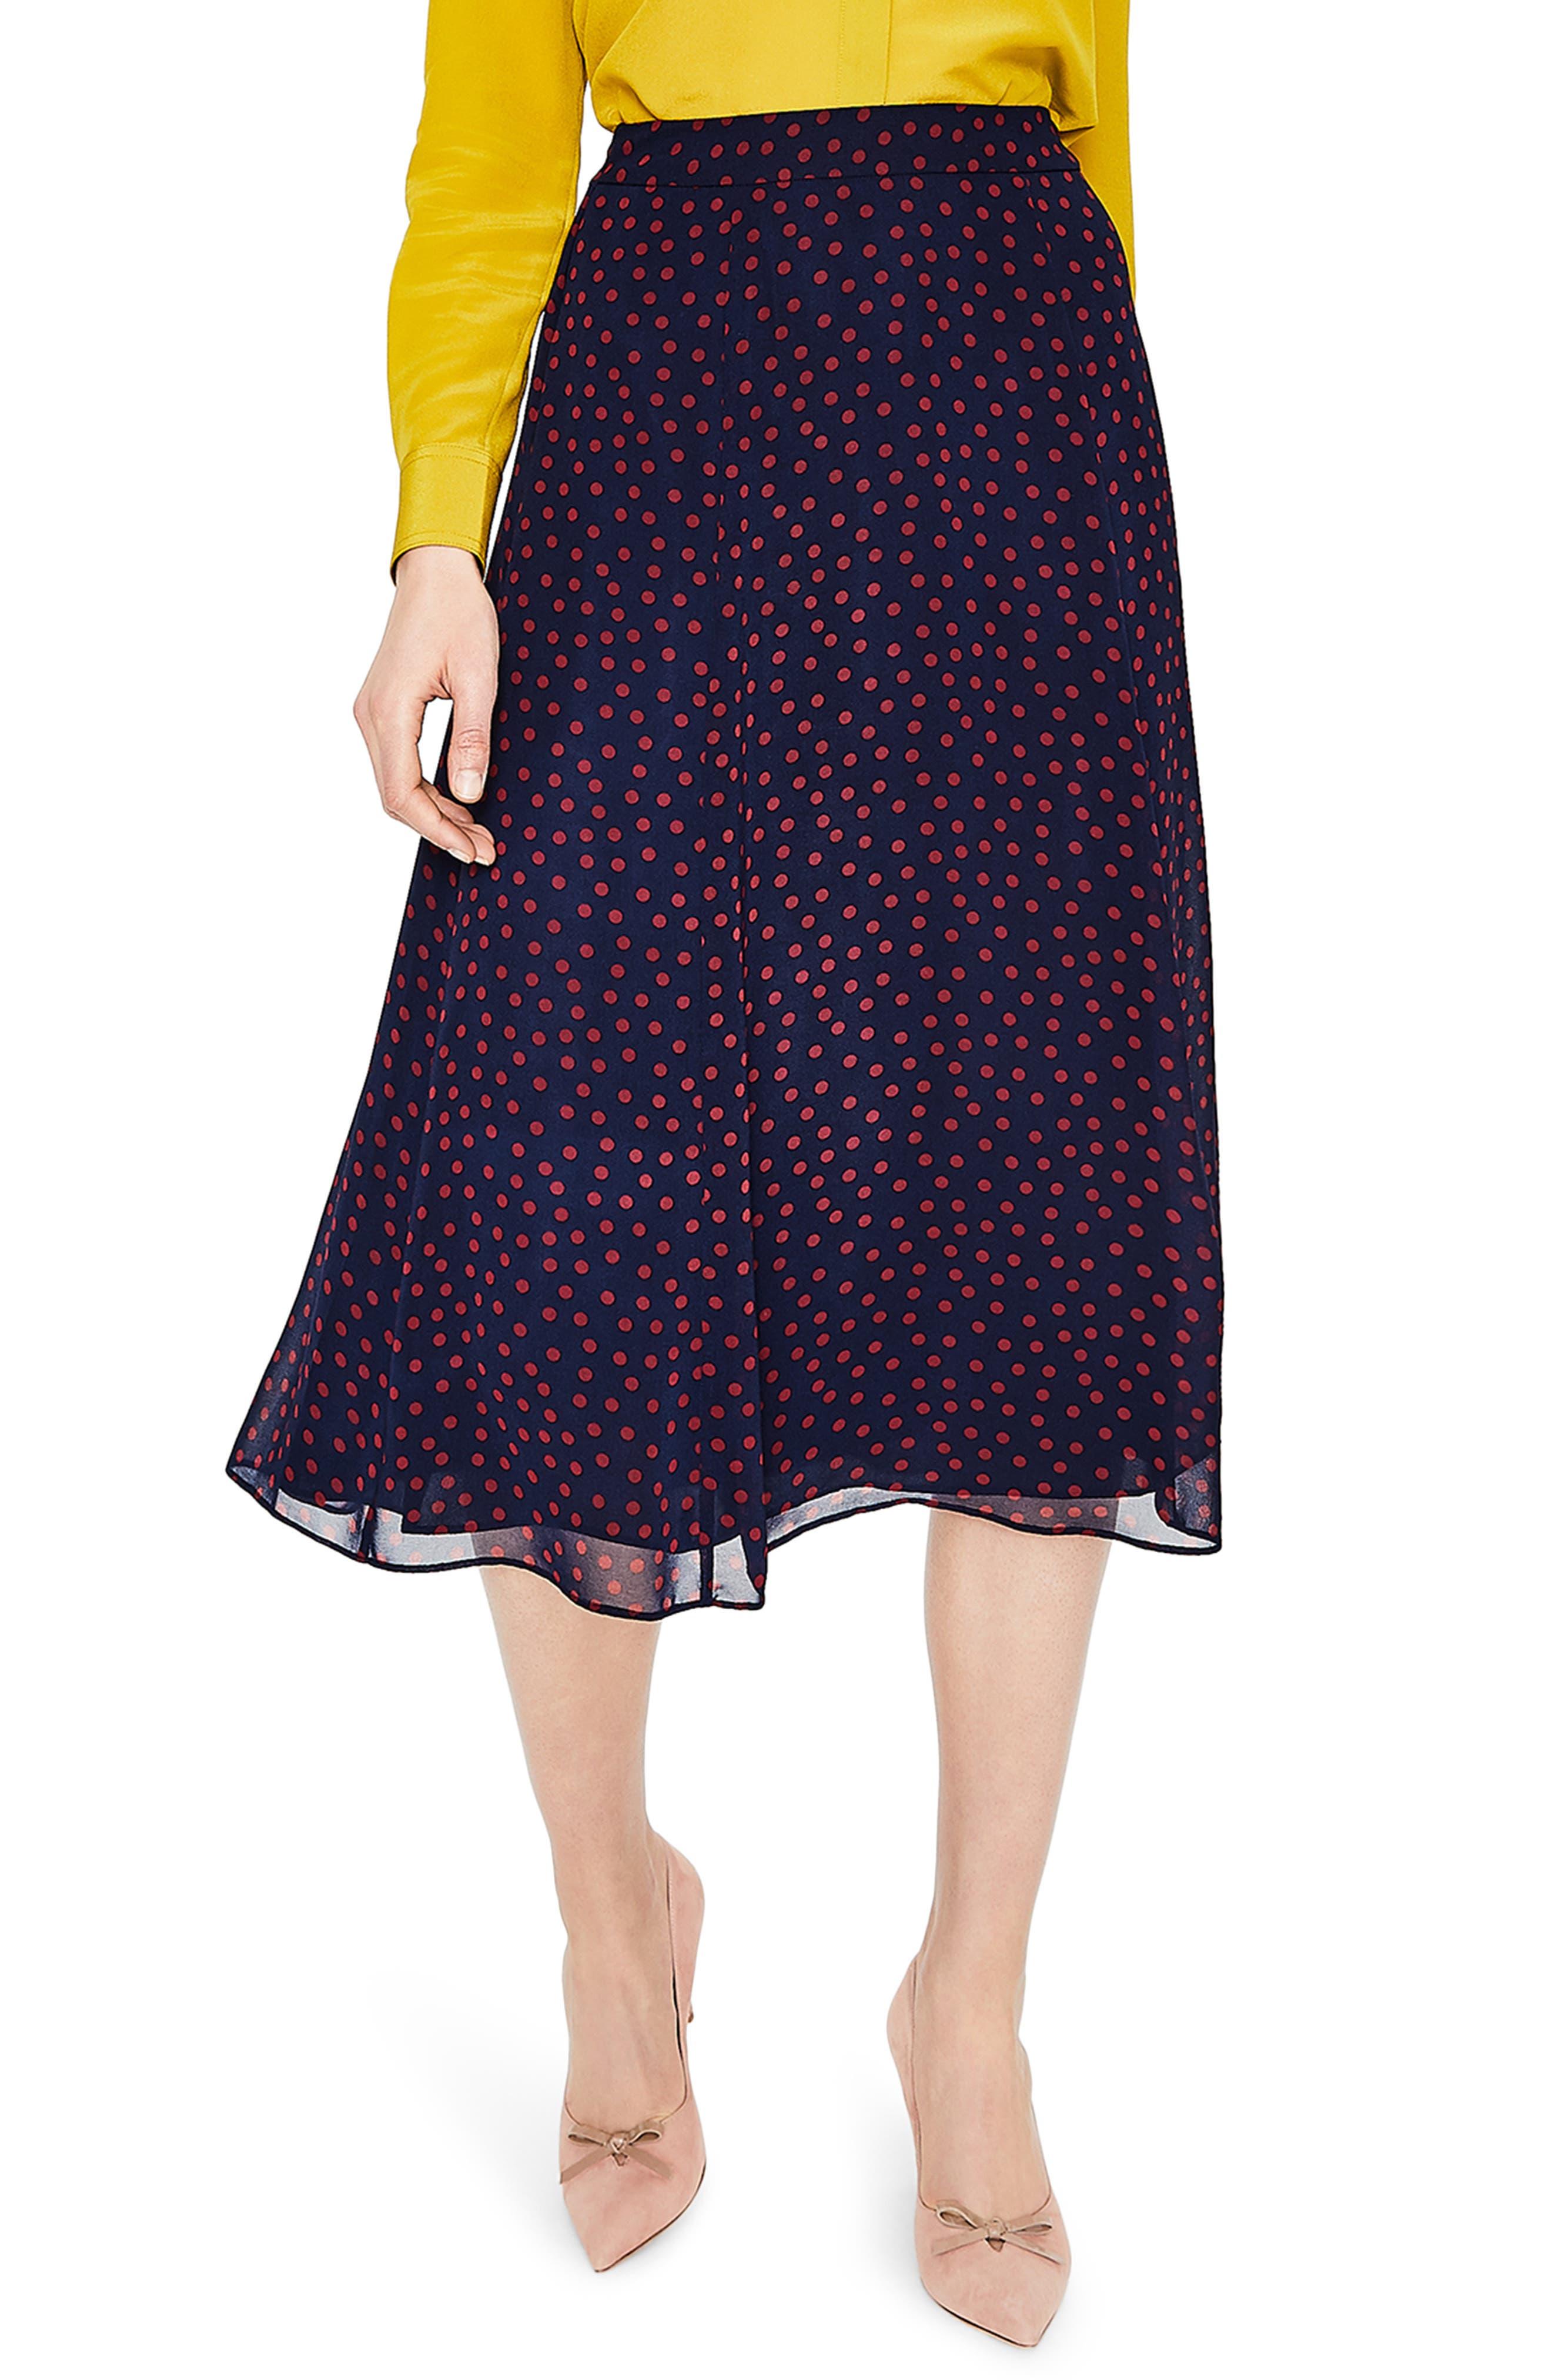 Polka Dot A-Line Skirt,                             Main thumbnail 1, color,                             934